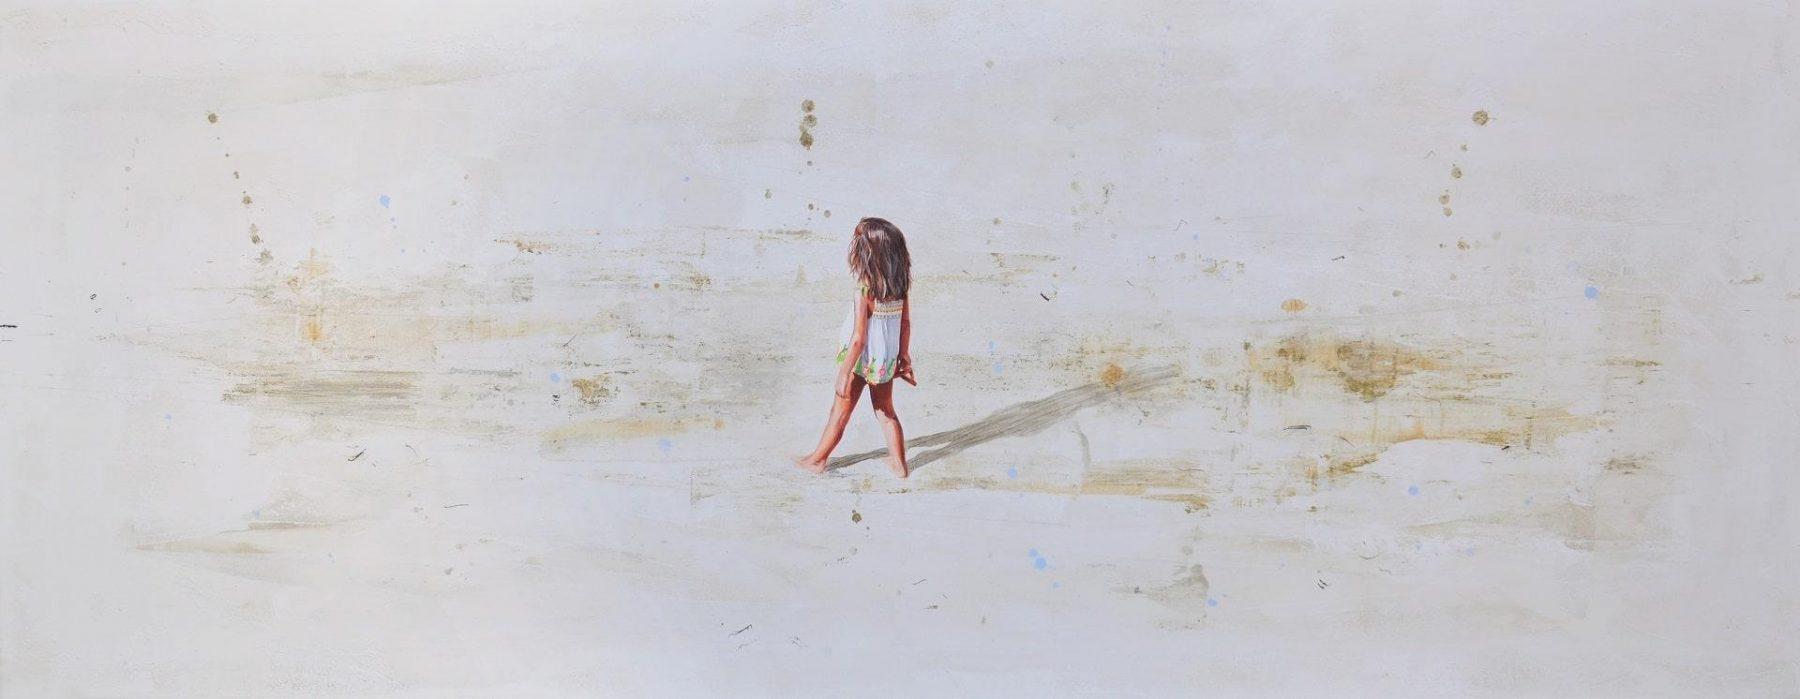 Nina blusa blanca en la playa - Solana, Berta - k-2007SOL1